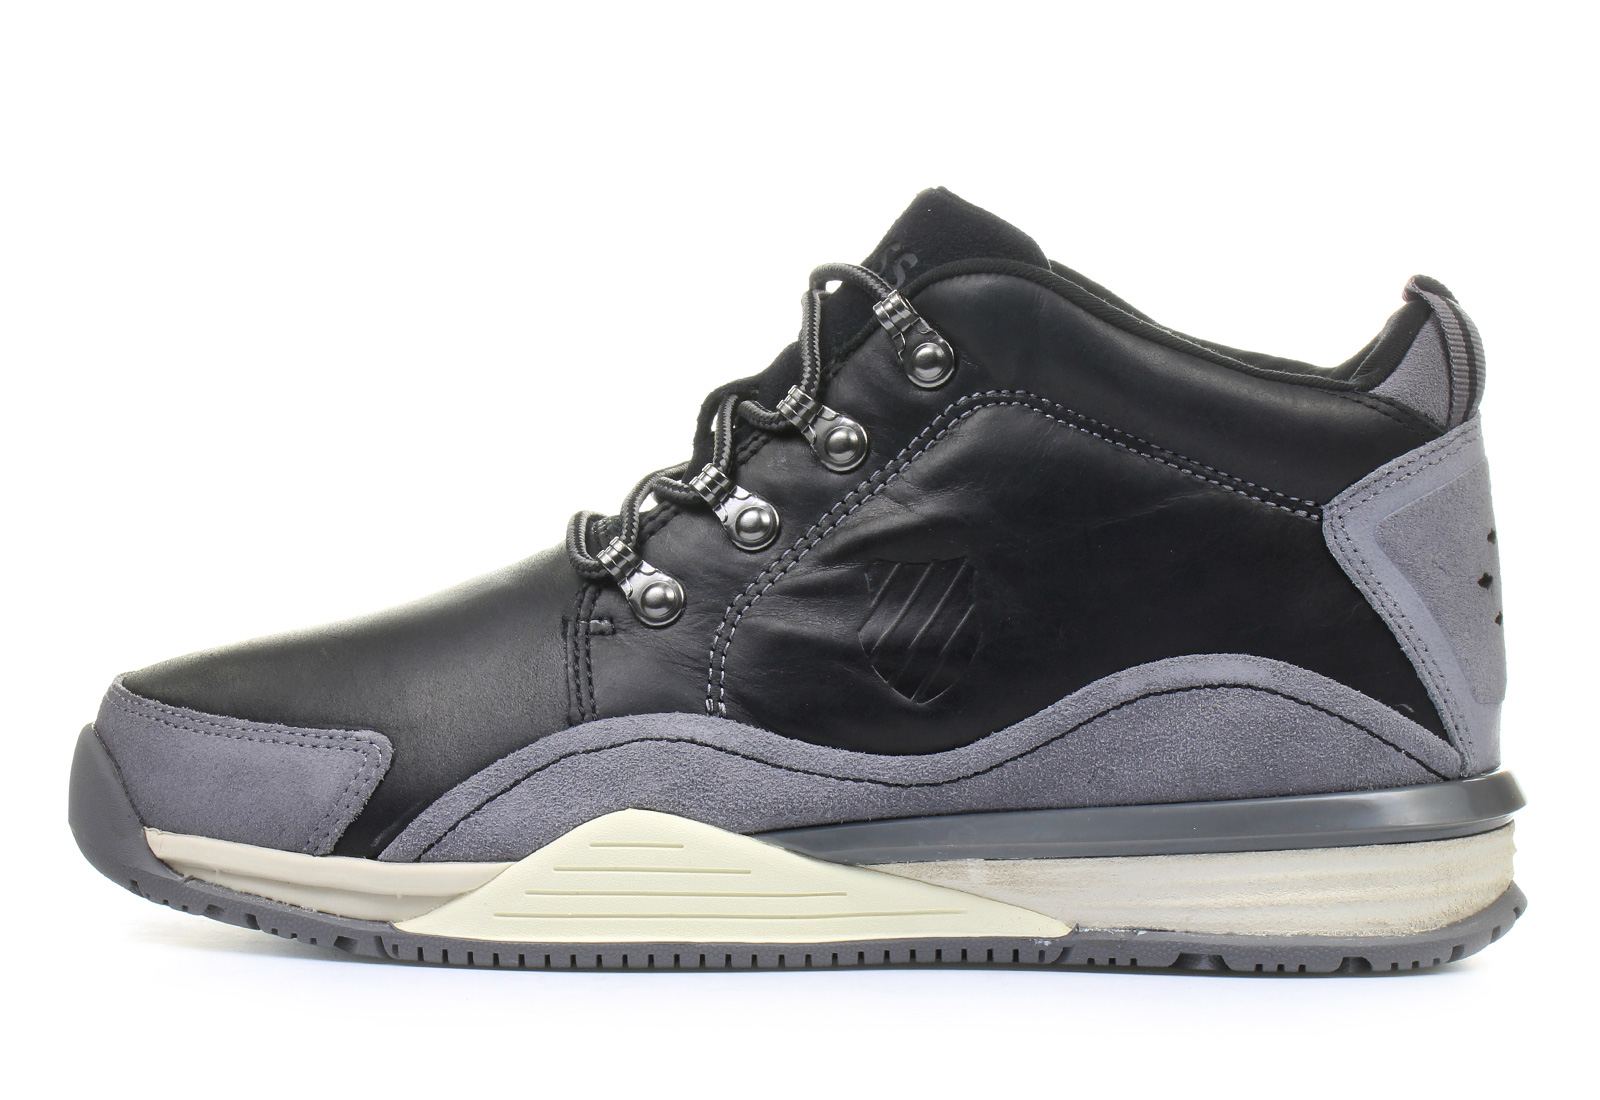 K Swiss Shoes Eaton Cmf 05077 052 M Online Shop For